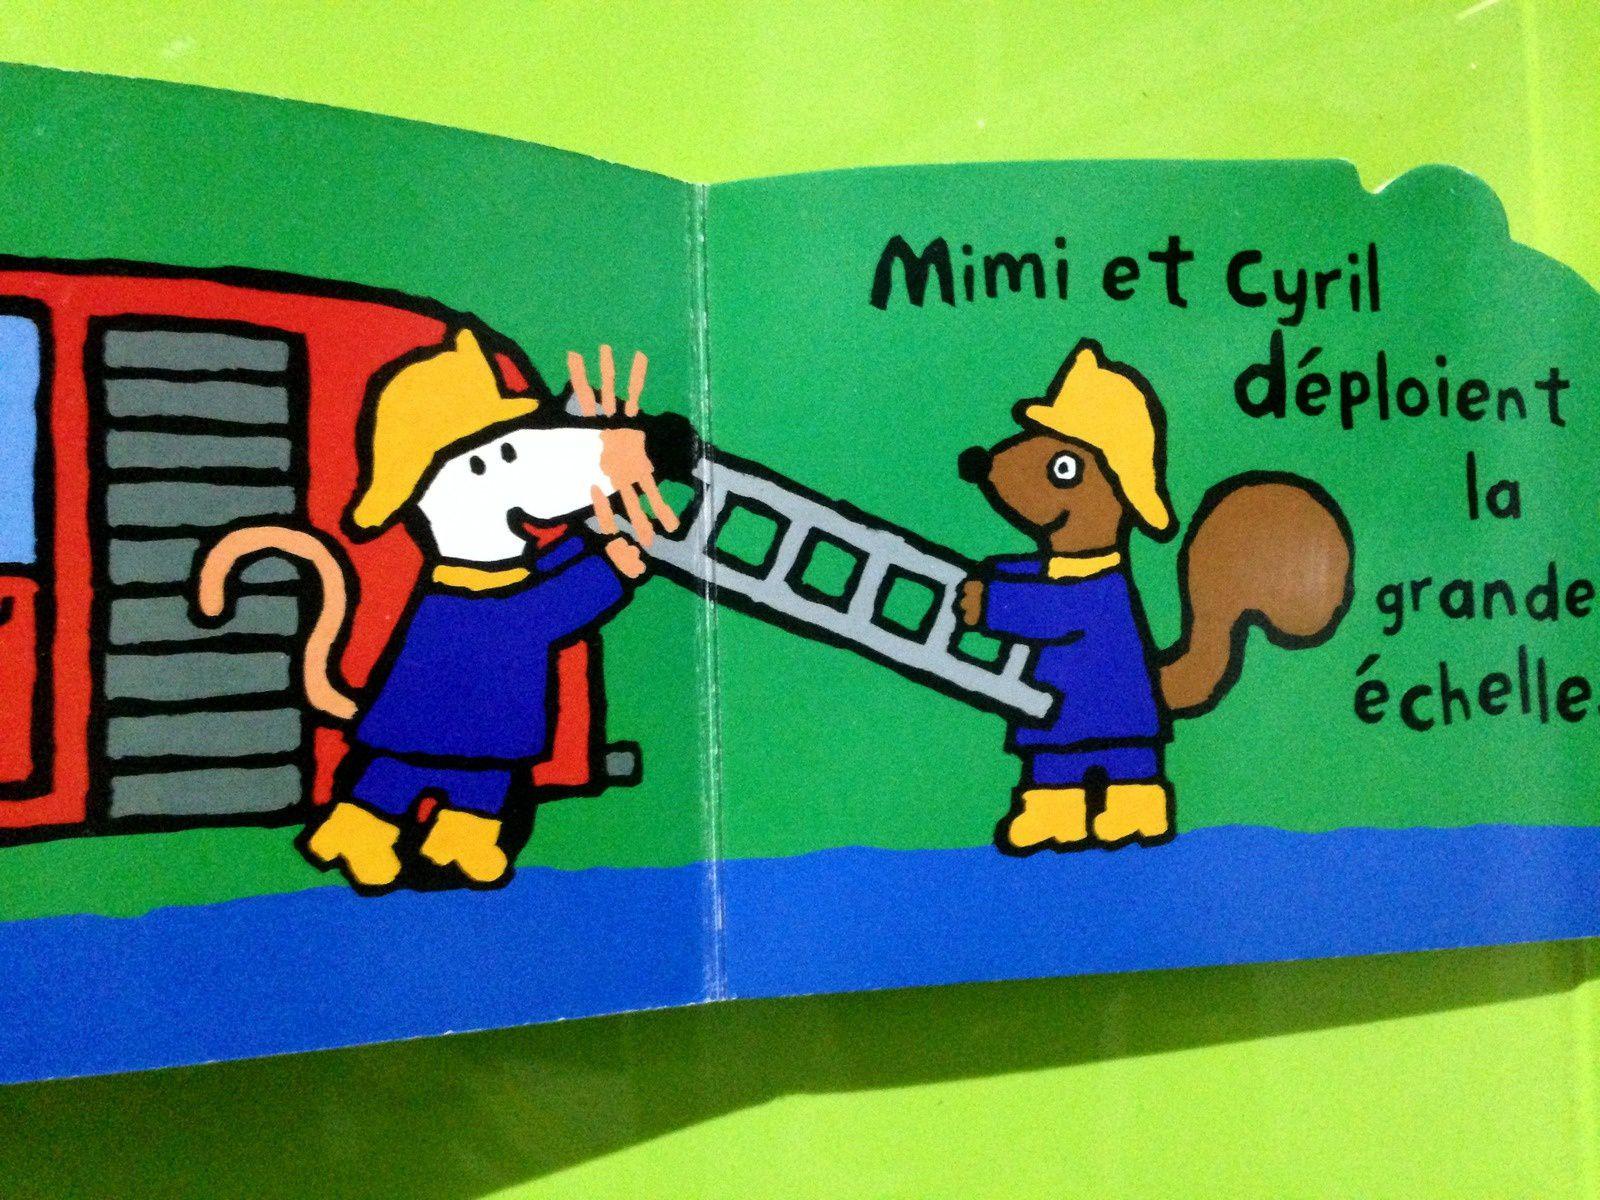 #mimilasouris #maisy #camiondepompier #livre #charlotteblabla blog